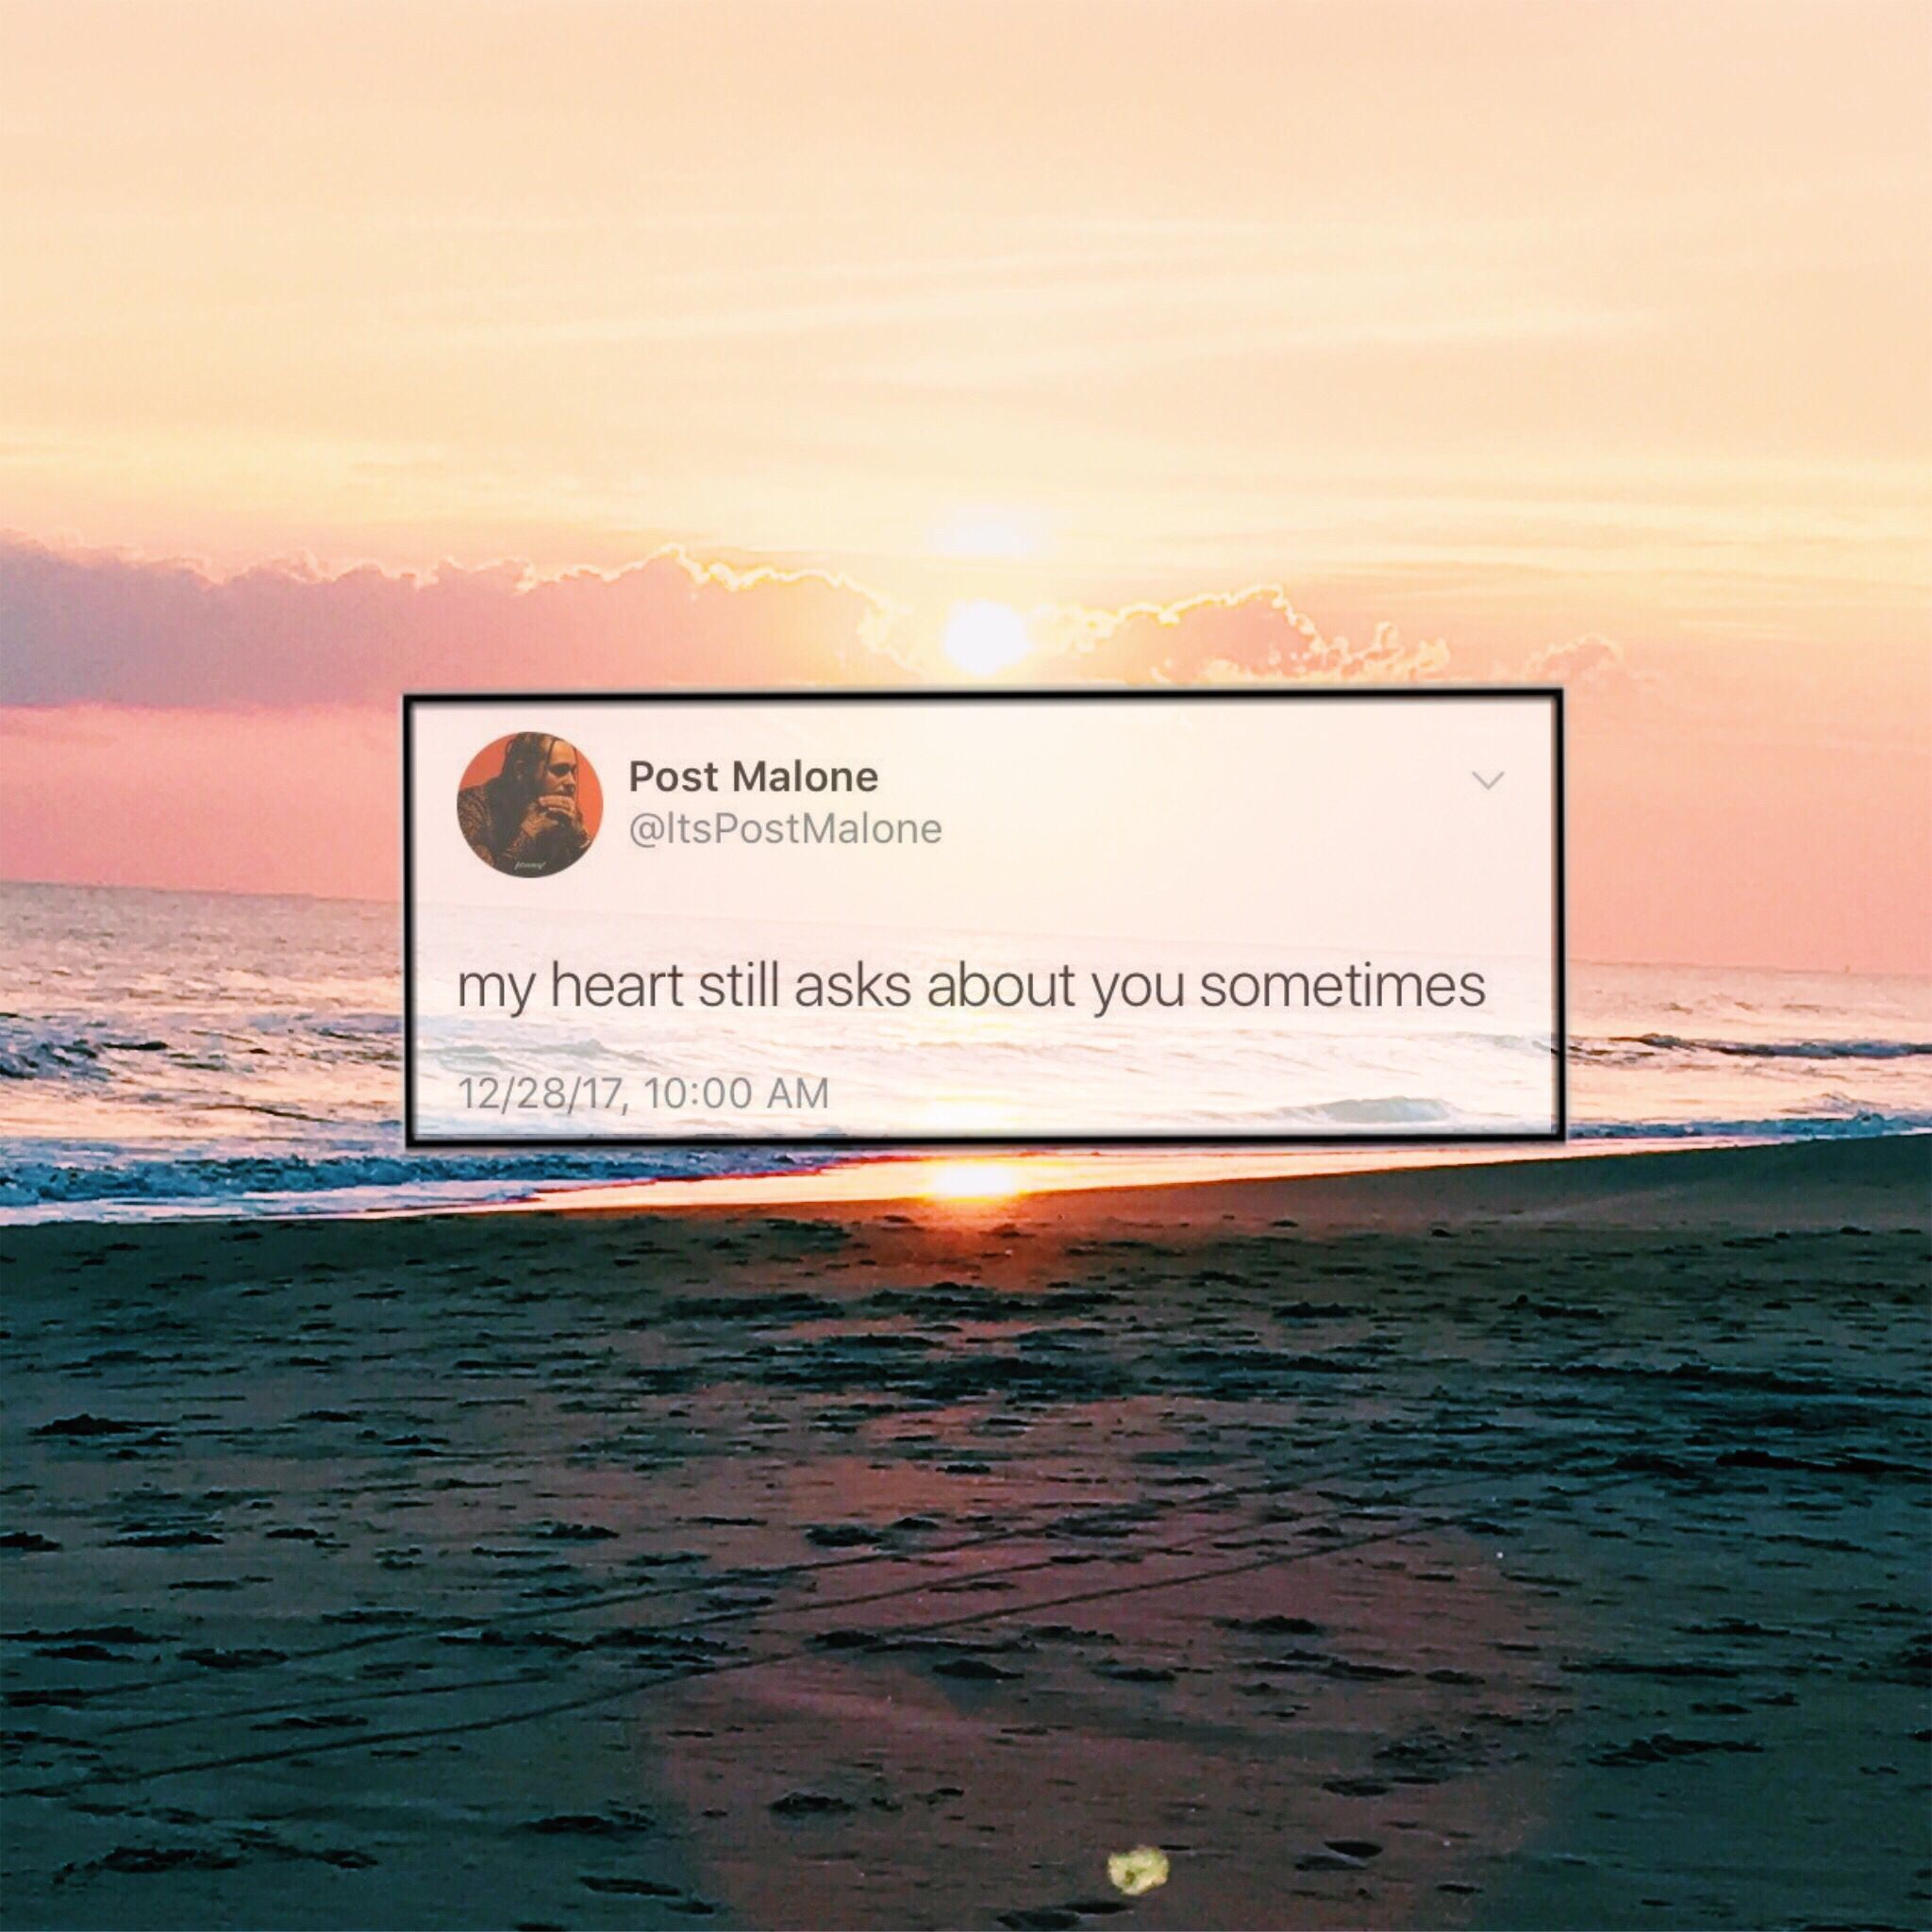 Post Malone Sad Quotes: A Post Malone Deep Tweet Edit